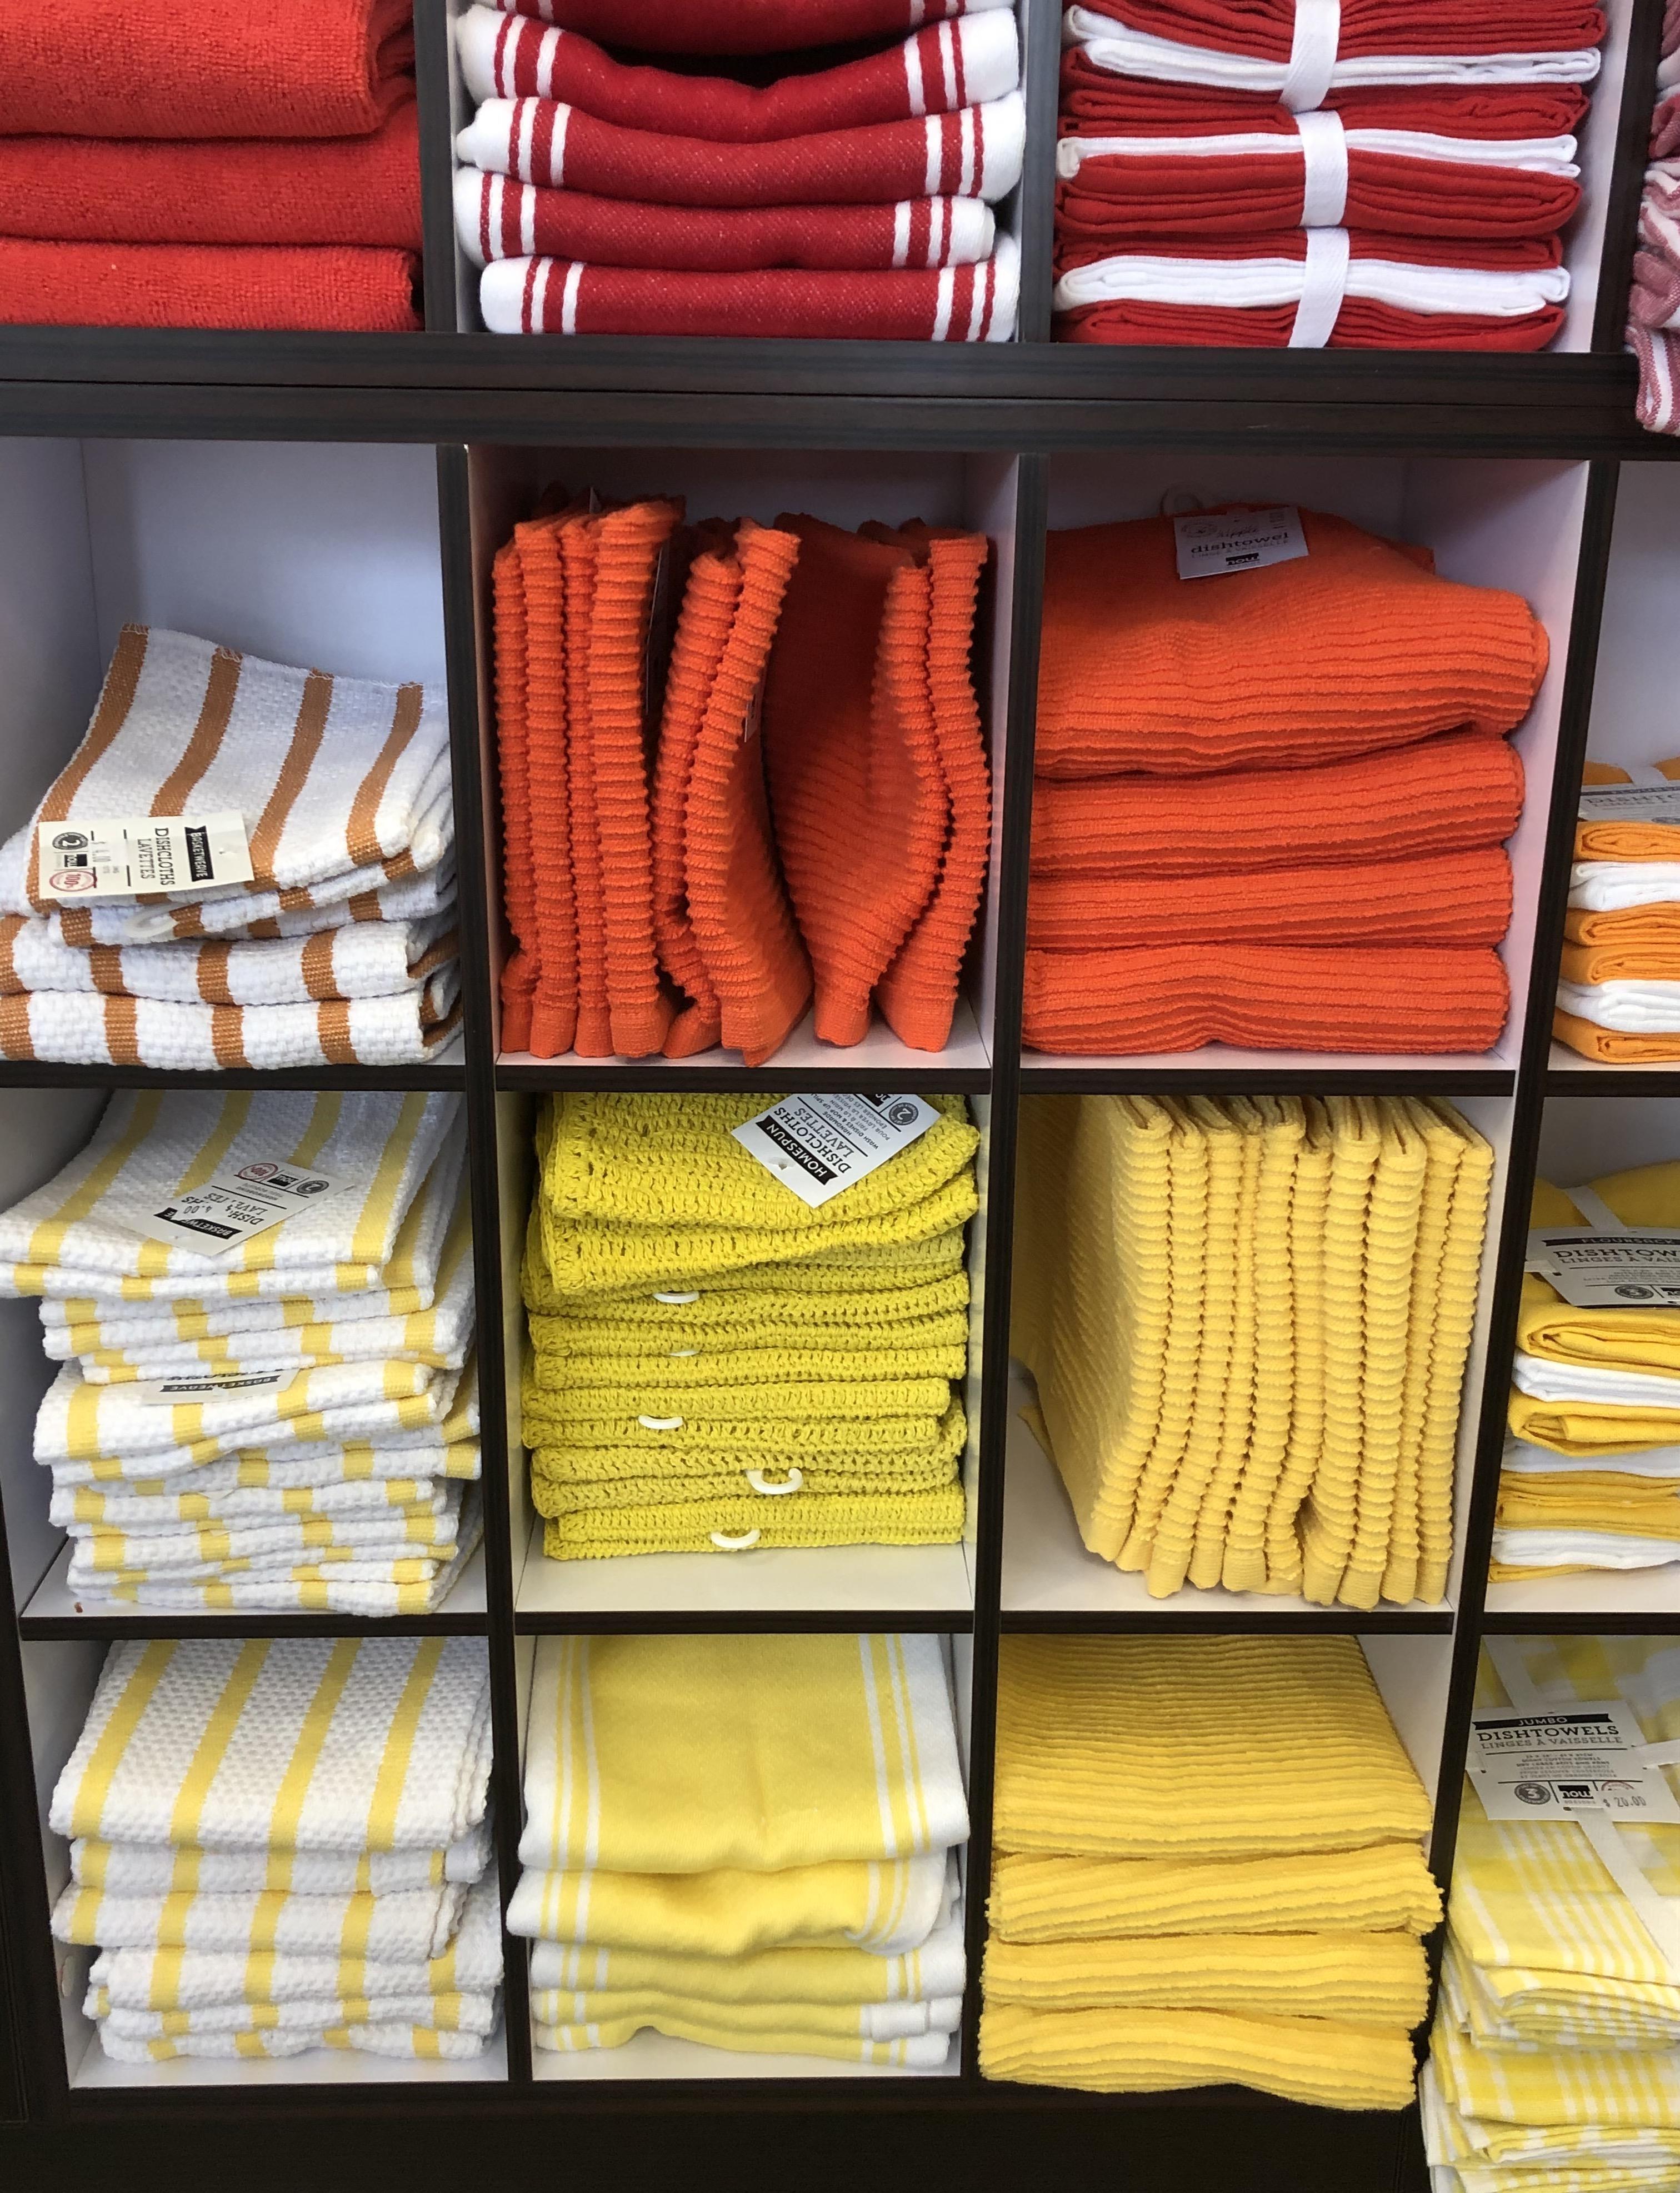 textiles_towels_napkins_karmin's_kitchen _table